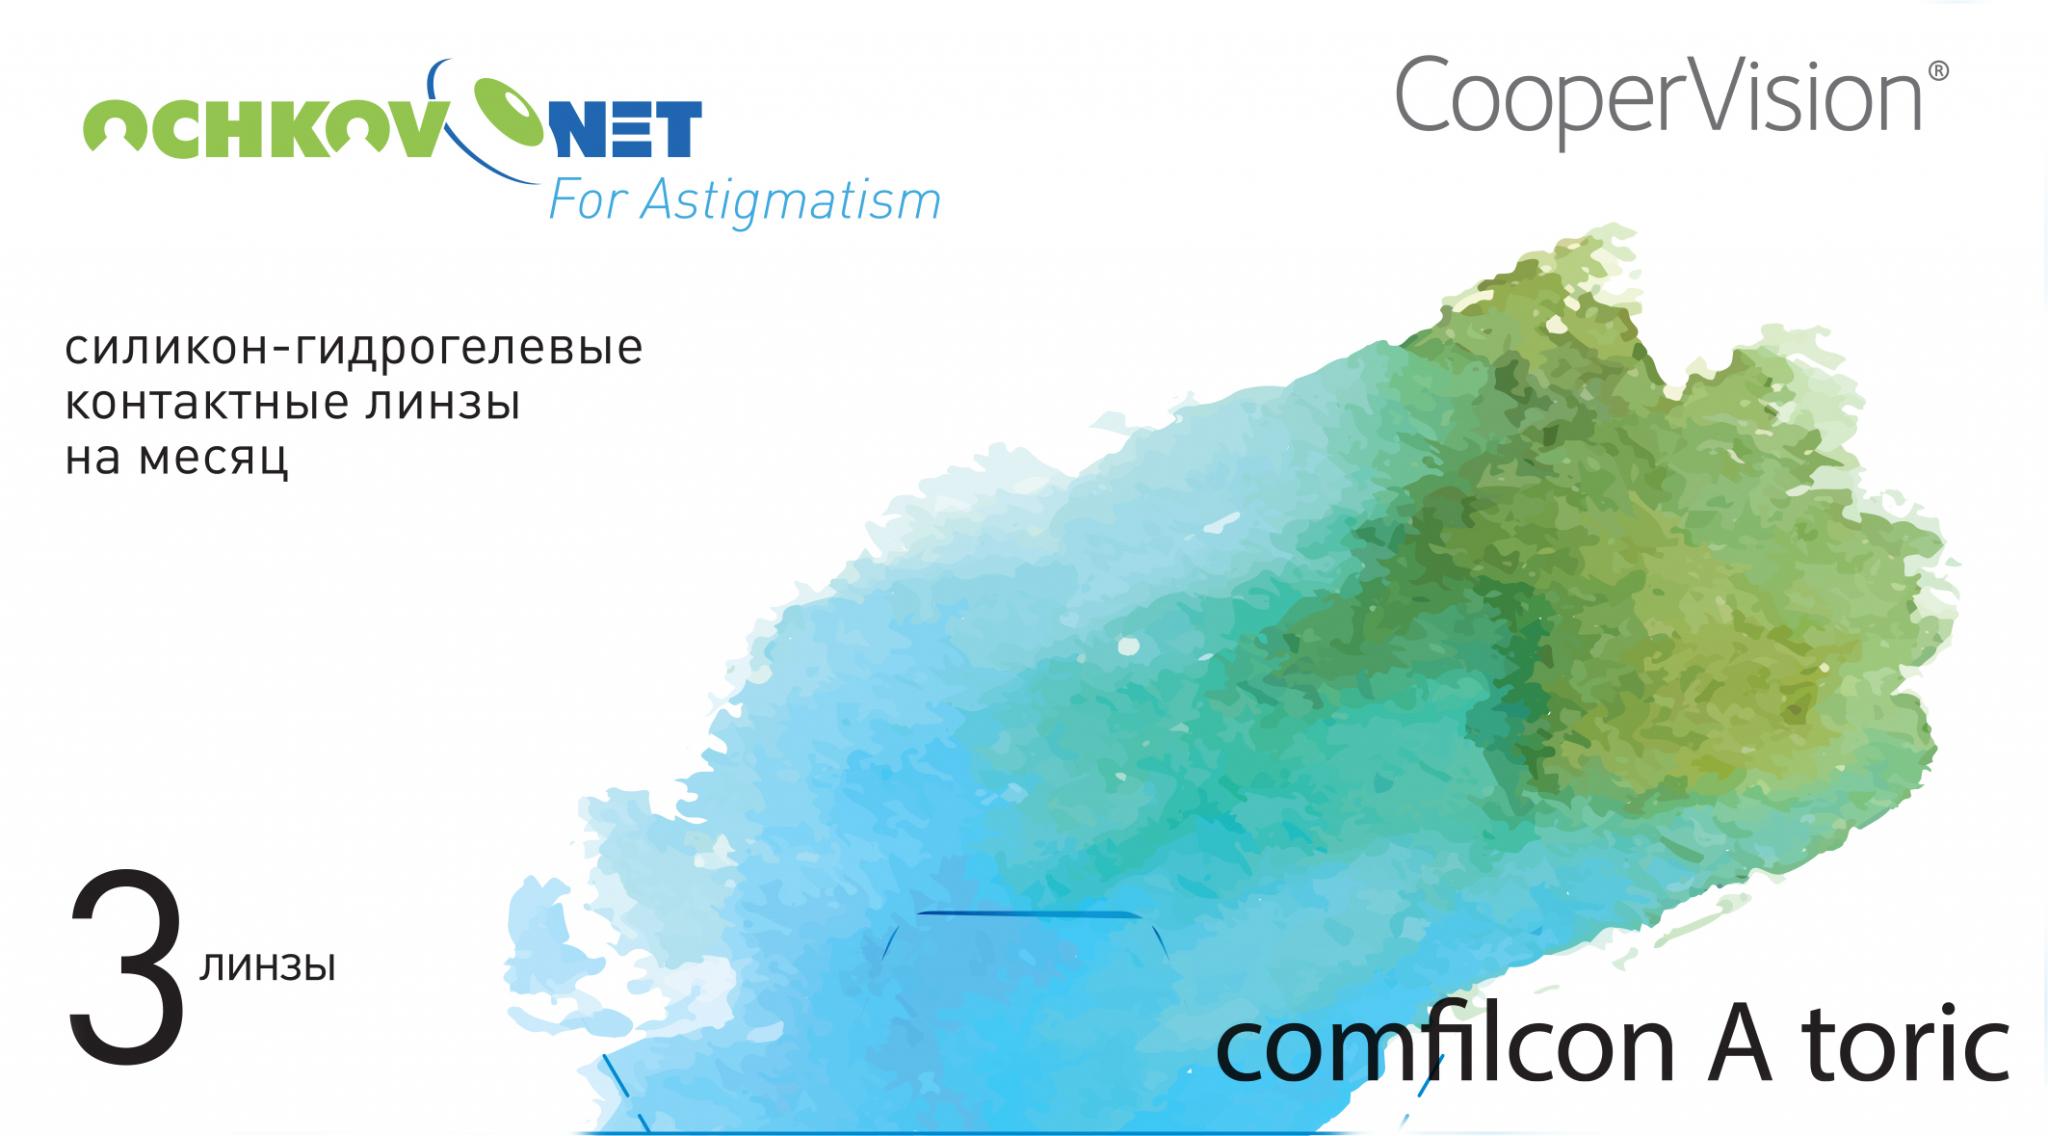 Контактные линзы Ochkov.Net for Astigmatism (3 линзы)